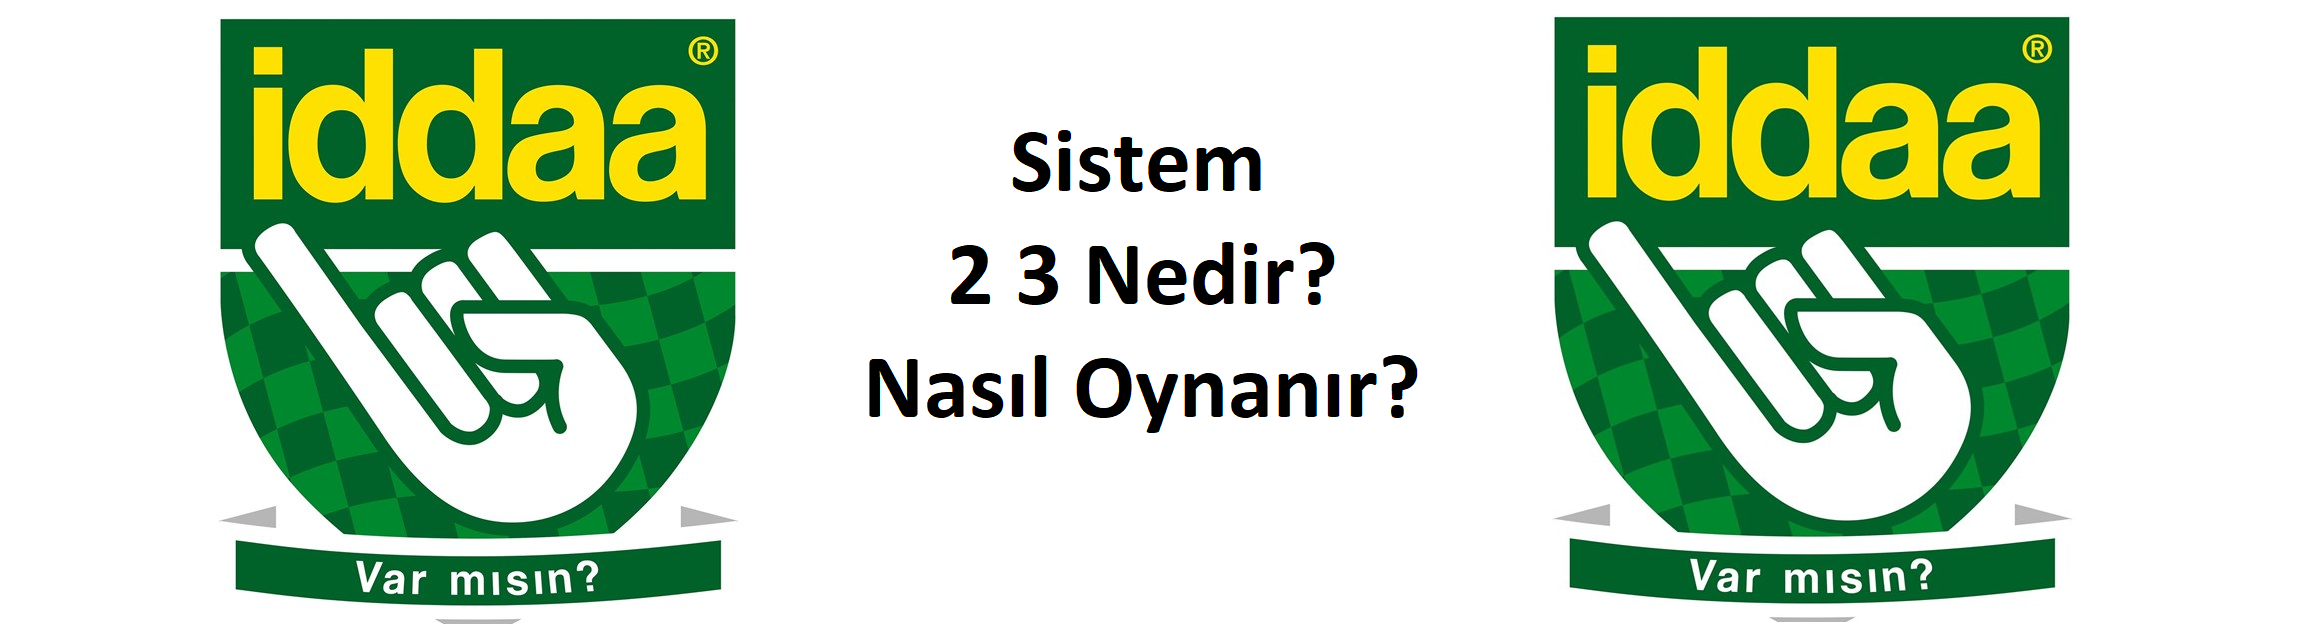 sistem 2 3 nedir, sistem 2 3 hesaplama, iddaa sistem 2 3